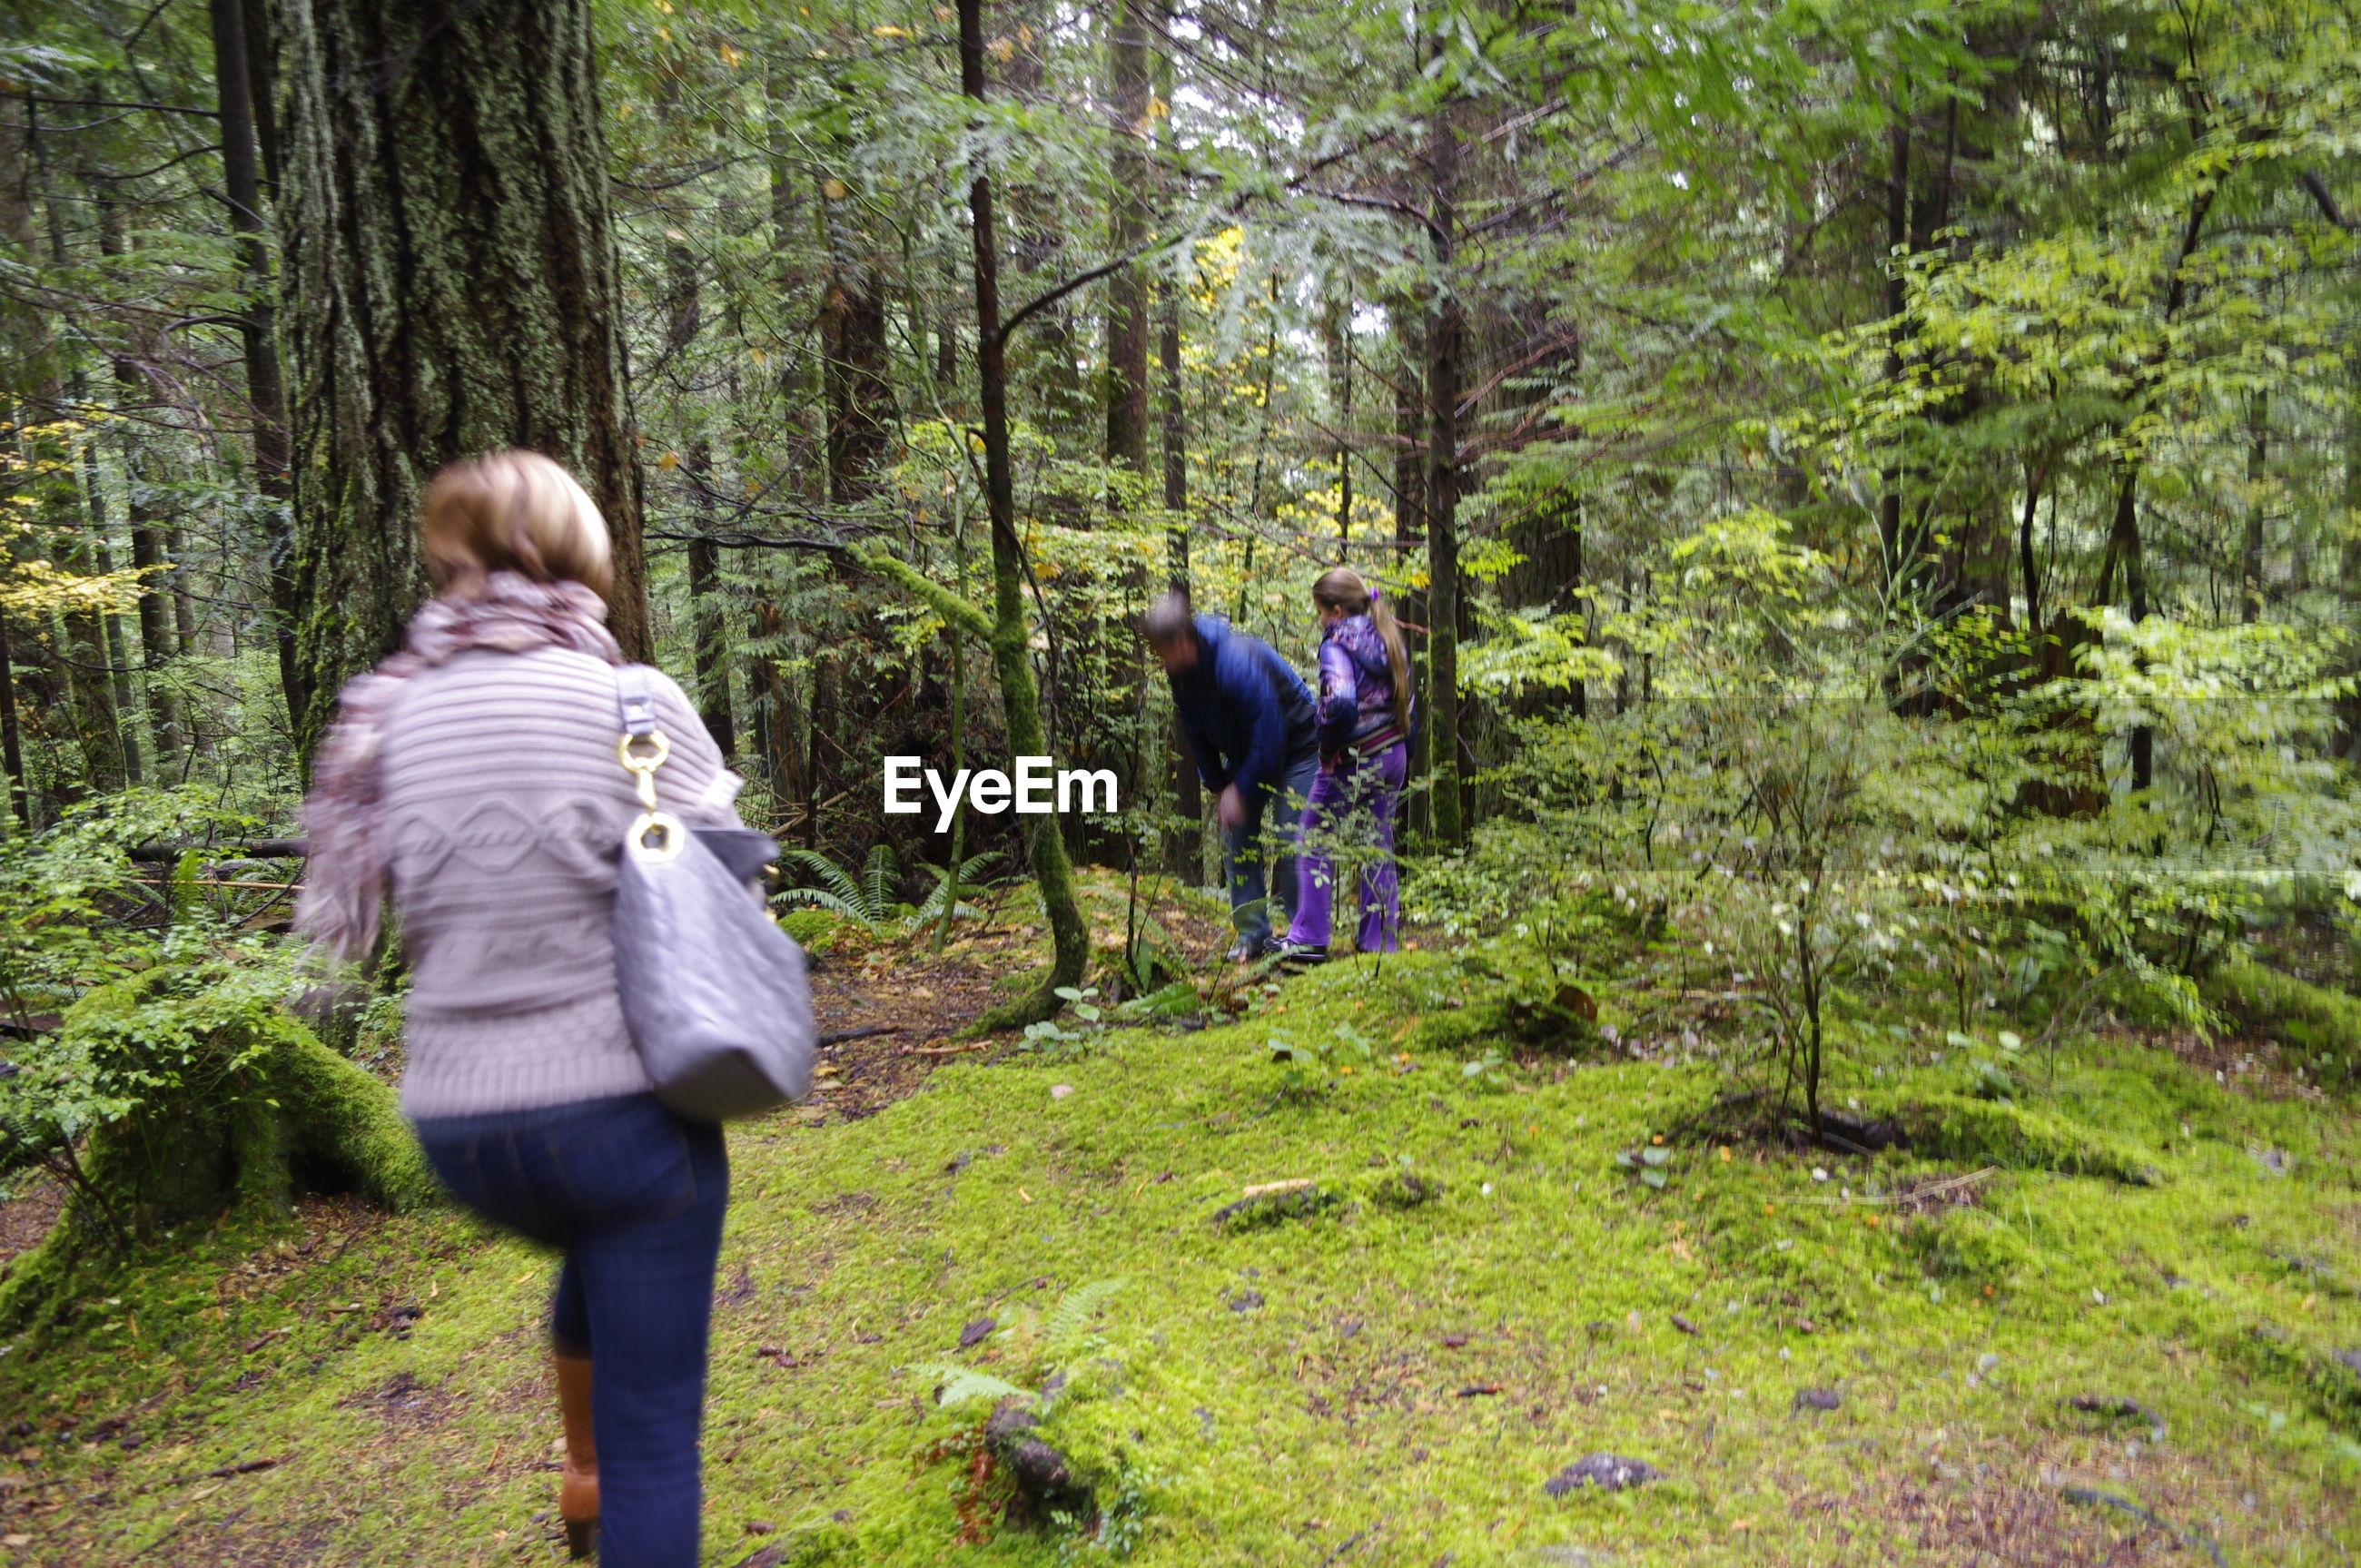 REAR VIEW OF WOMEN WALKING ON TREES IN FOREST